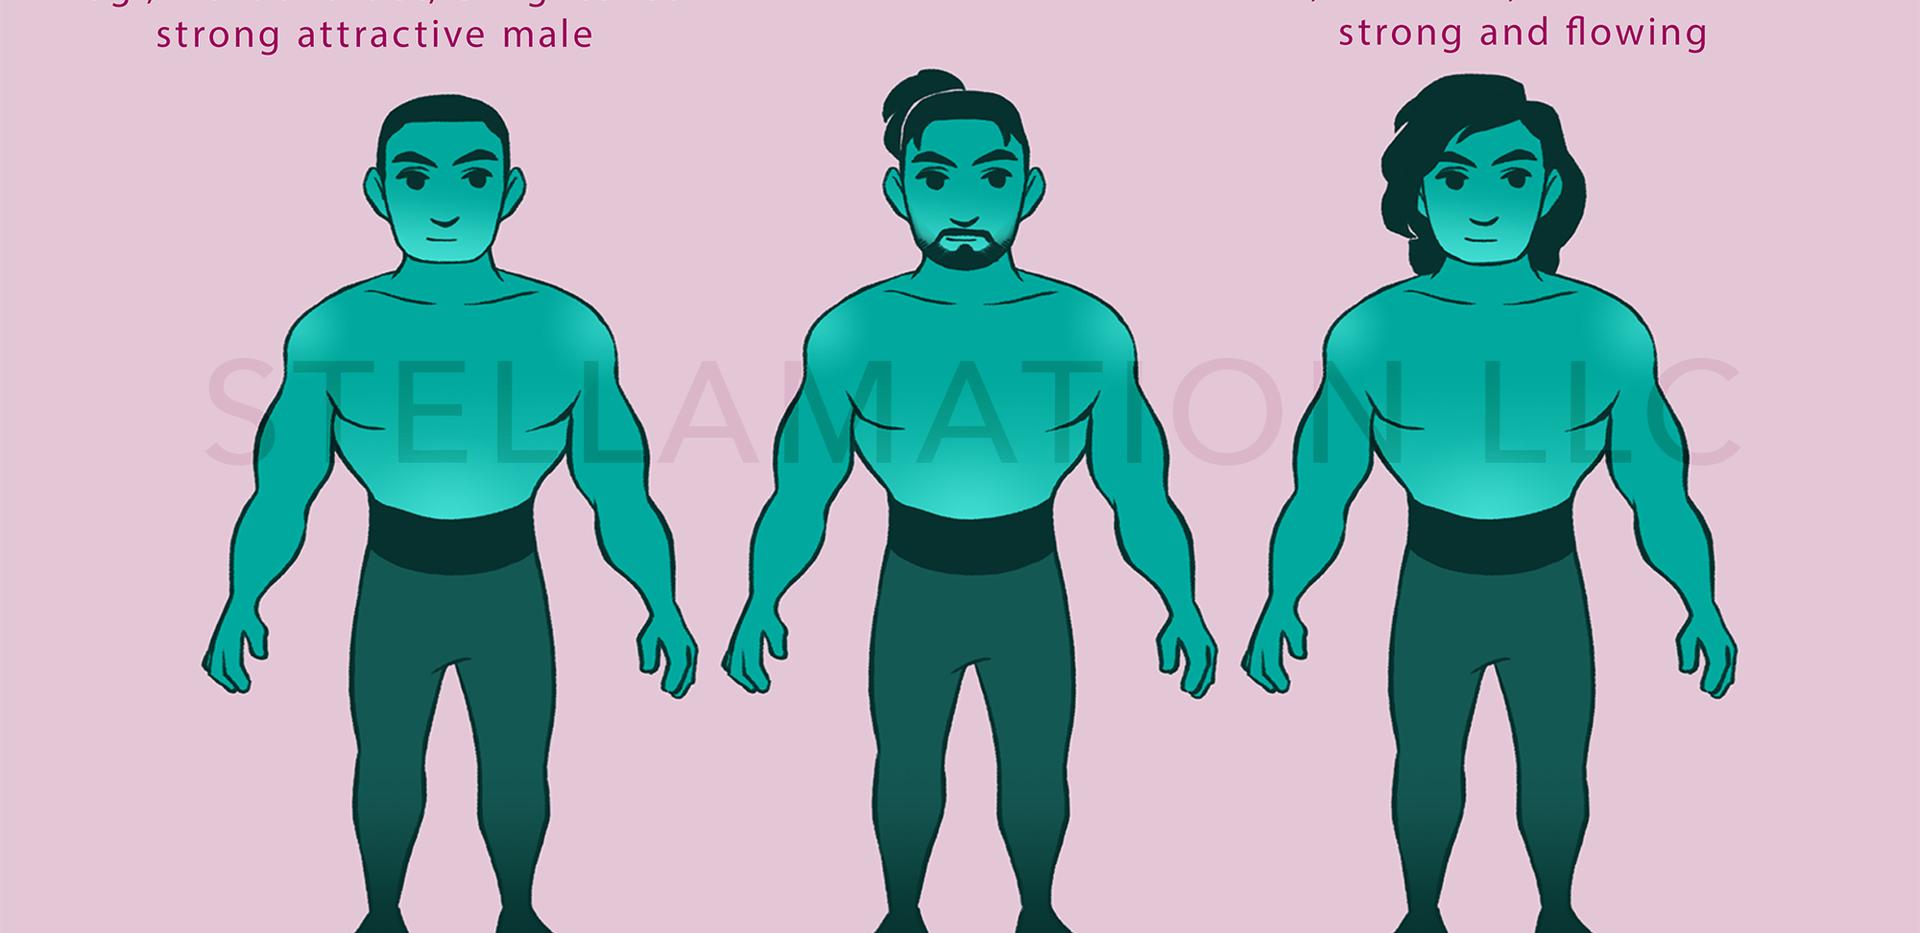 Galen Character Design